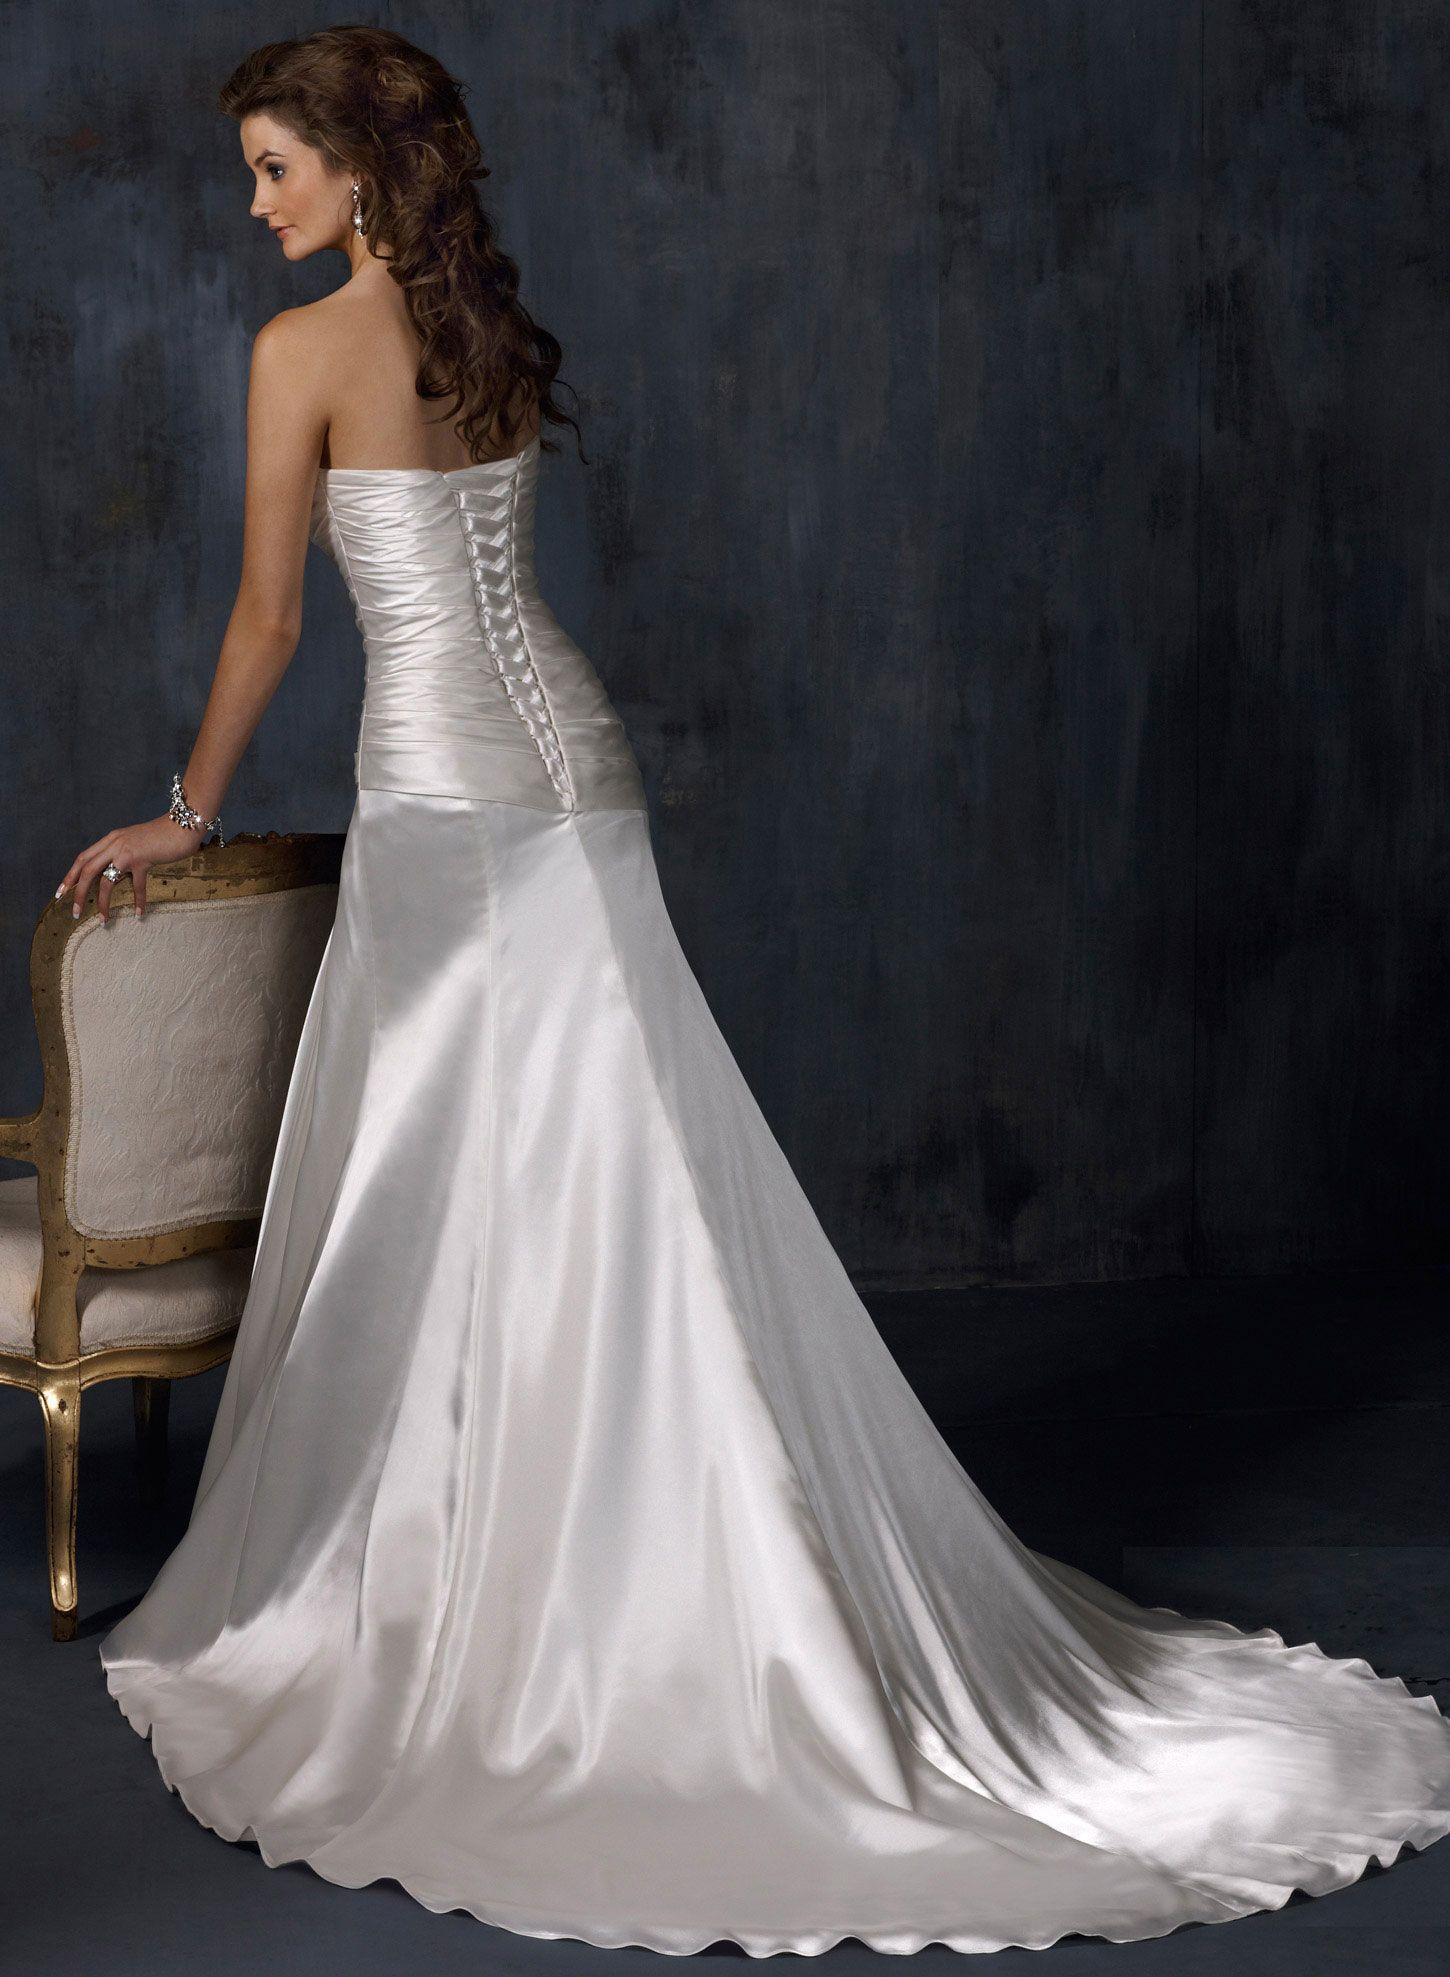 Silhouette wedding dresses simple bridal  Maggie Sottero Wedding Dresses  Maggie sottero White trash wedding